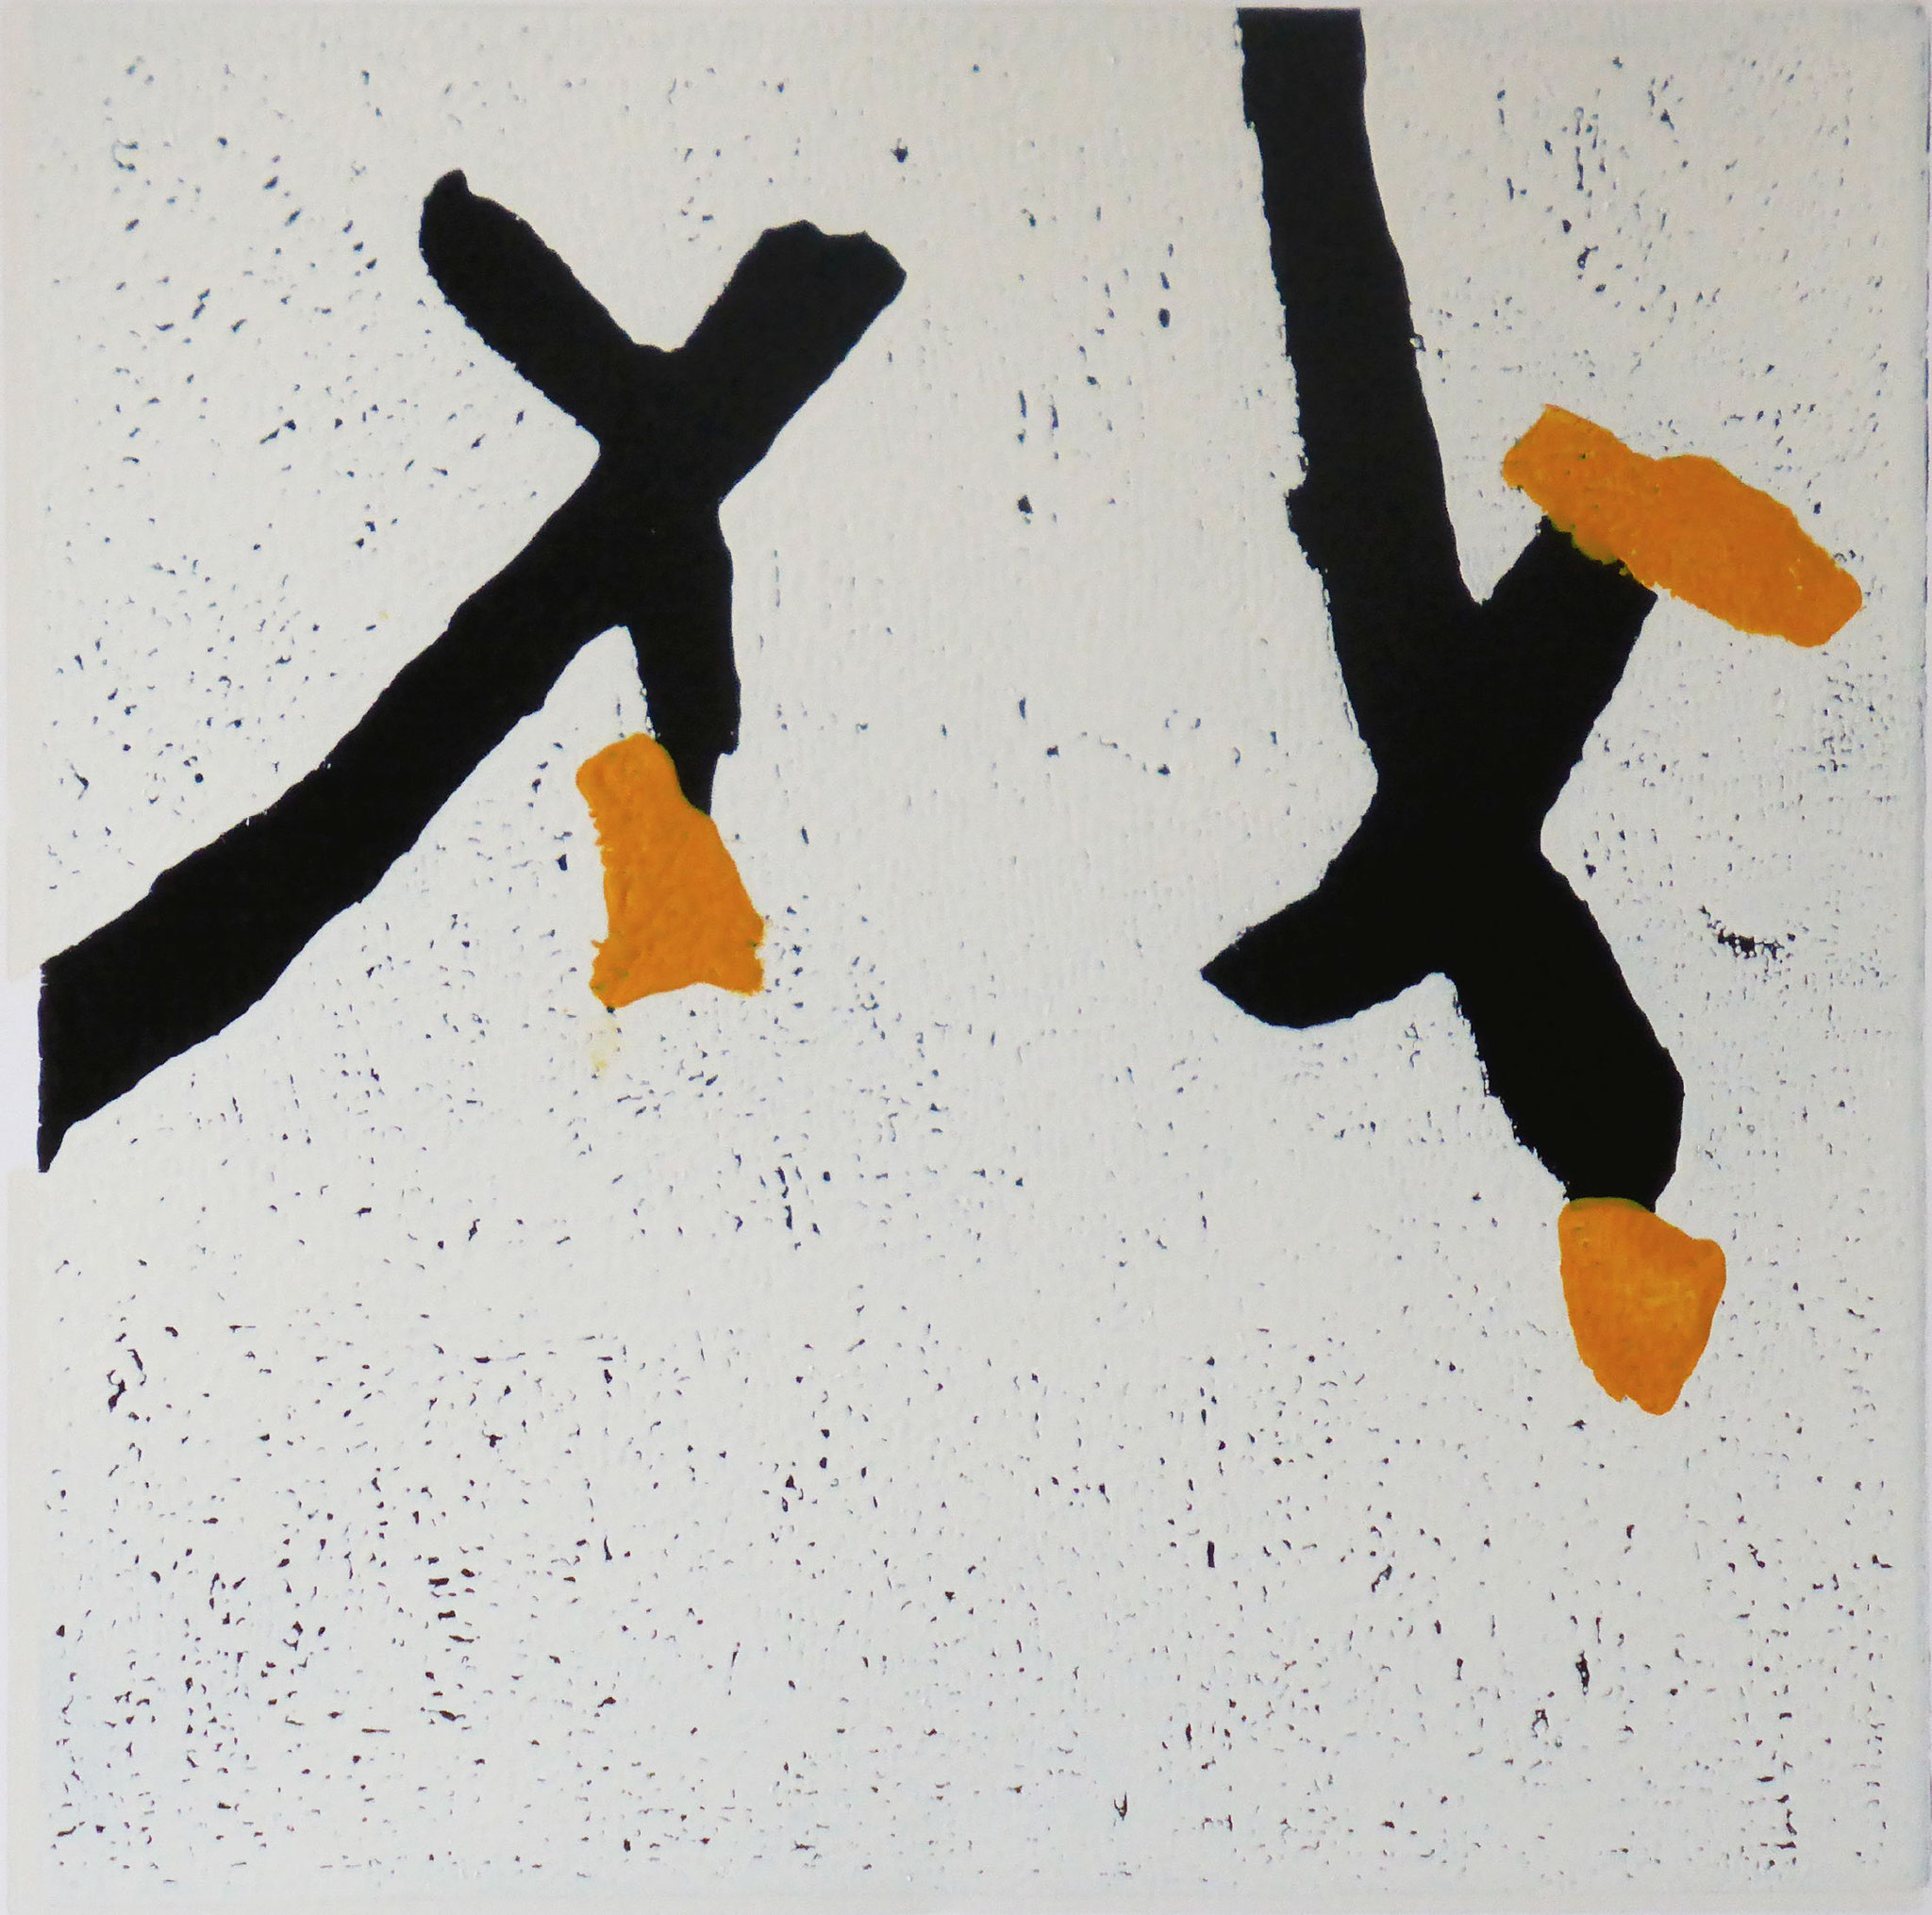 Tangentia 2, Farbholzschnitt, 35x35cm, 2014